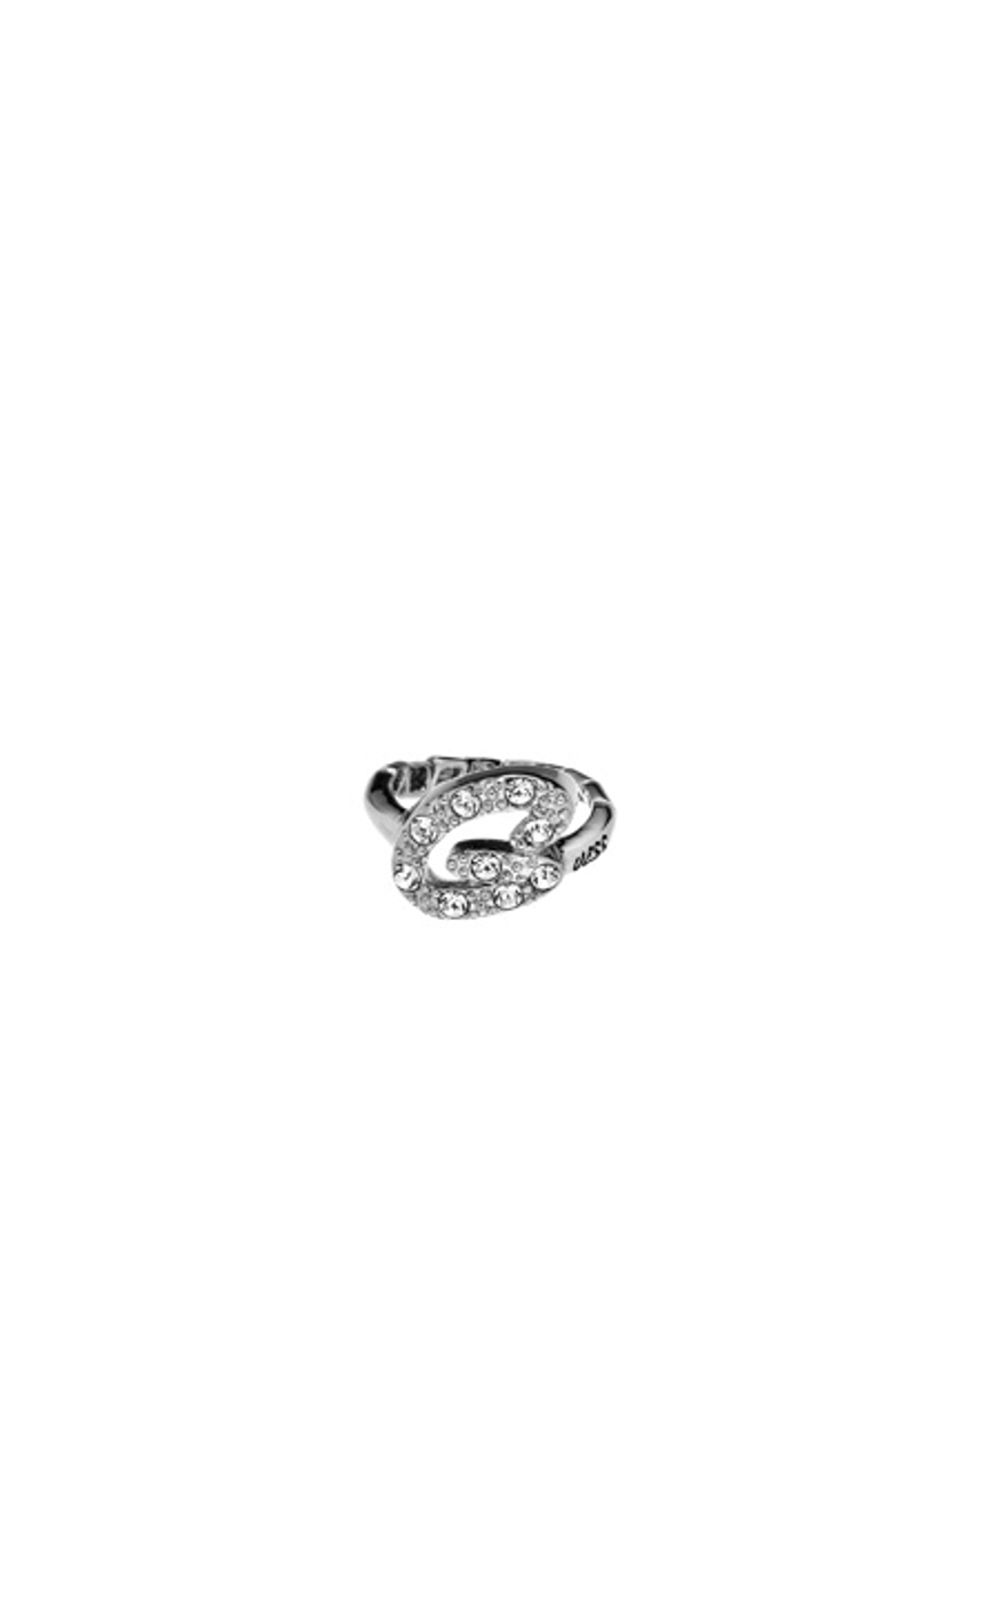 GUESS FAUX UBR31201 Ασημένιο Δαχτυλίδι Με Λογότυπο